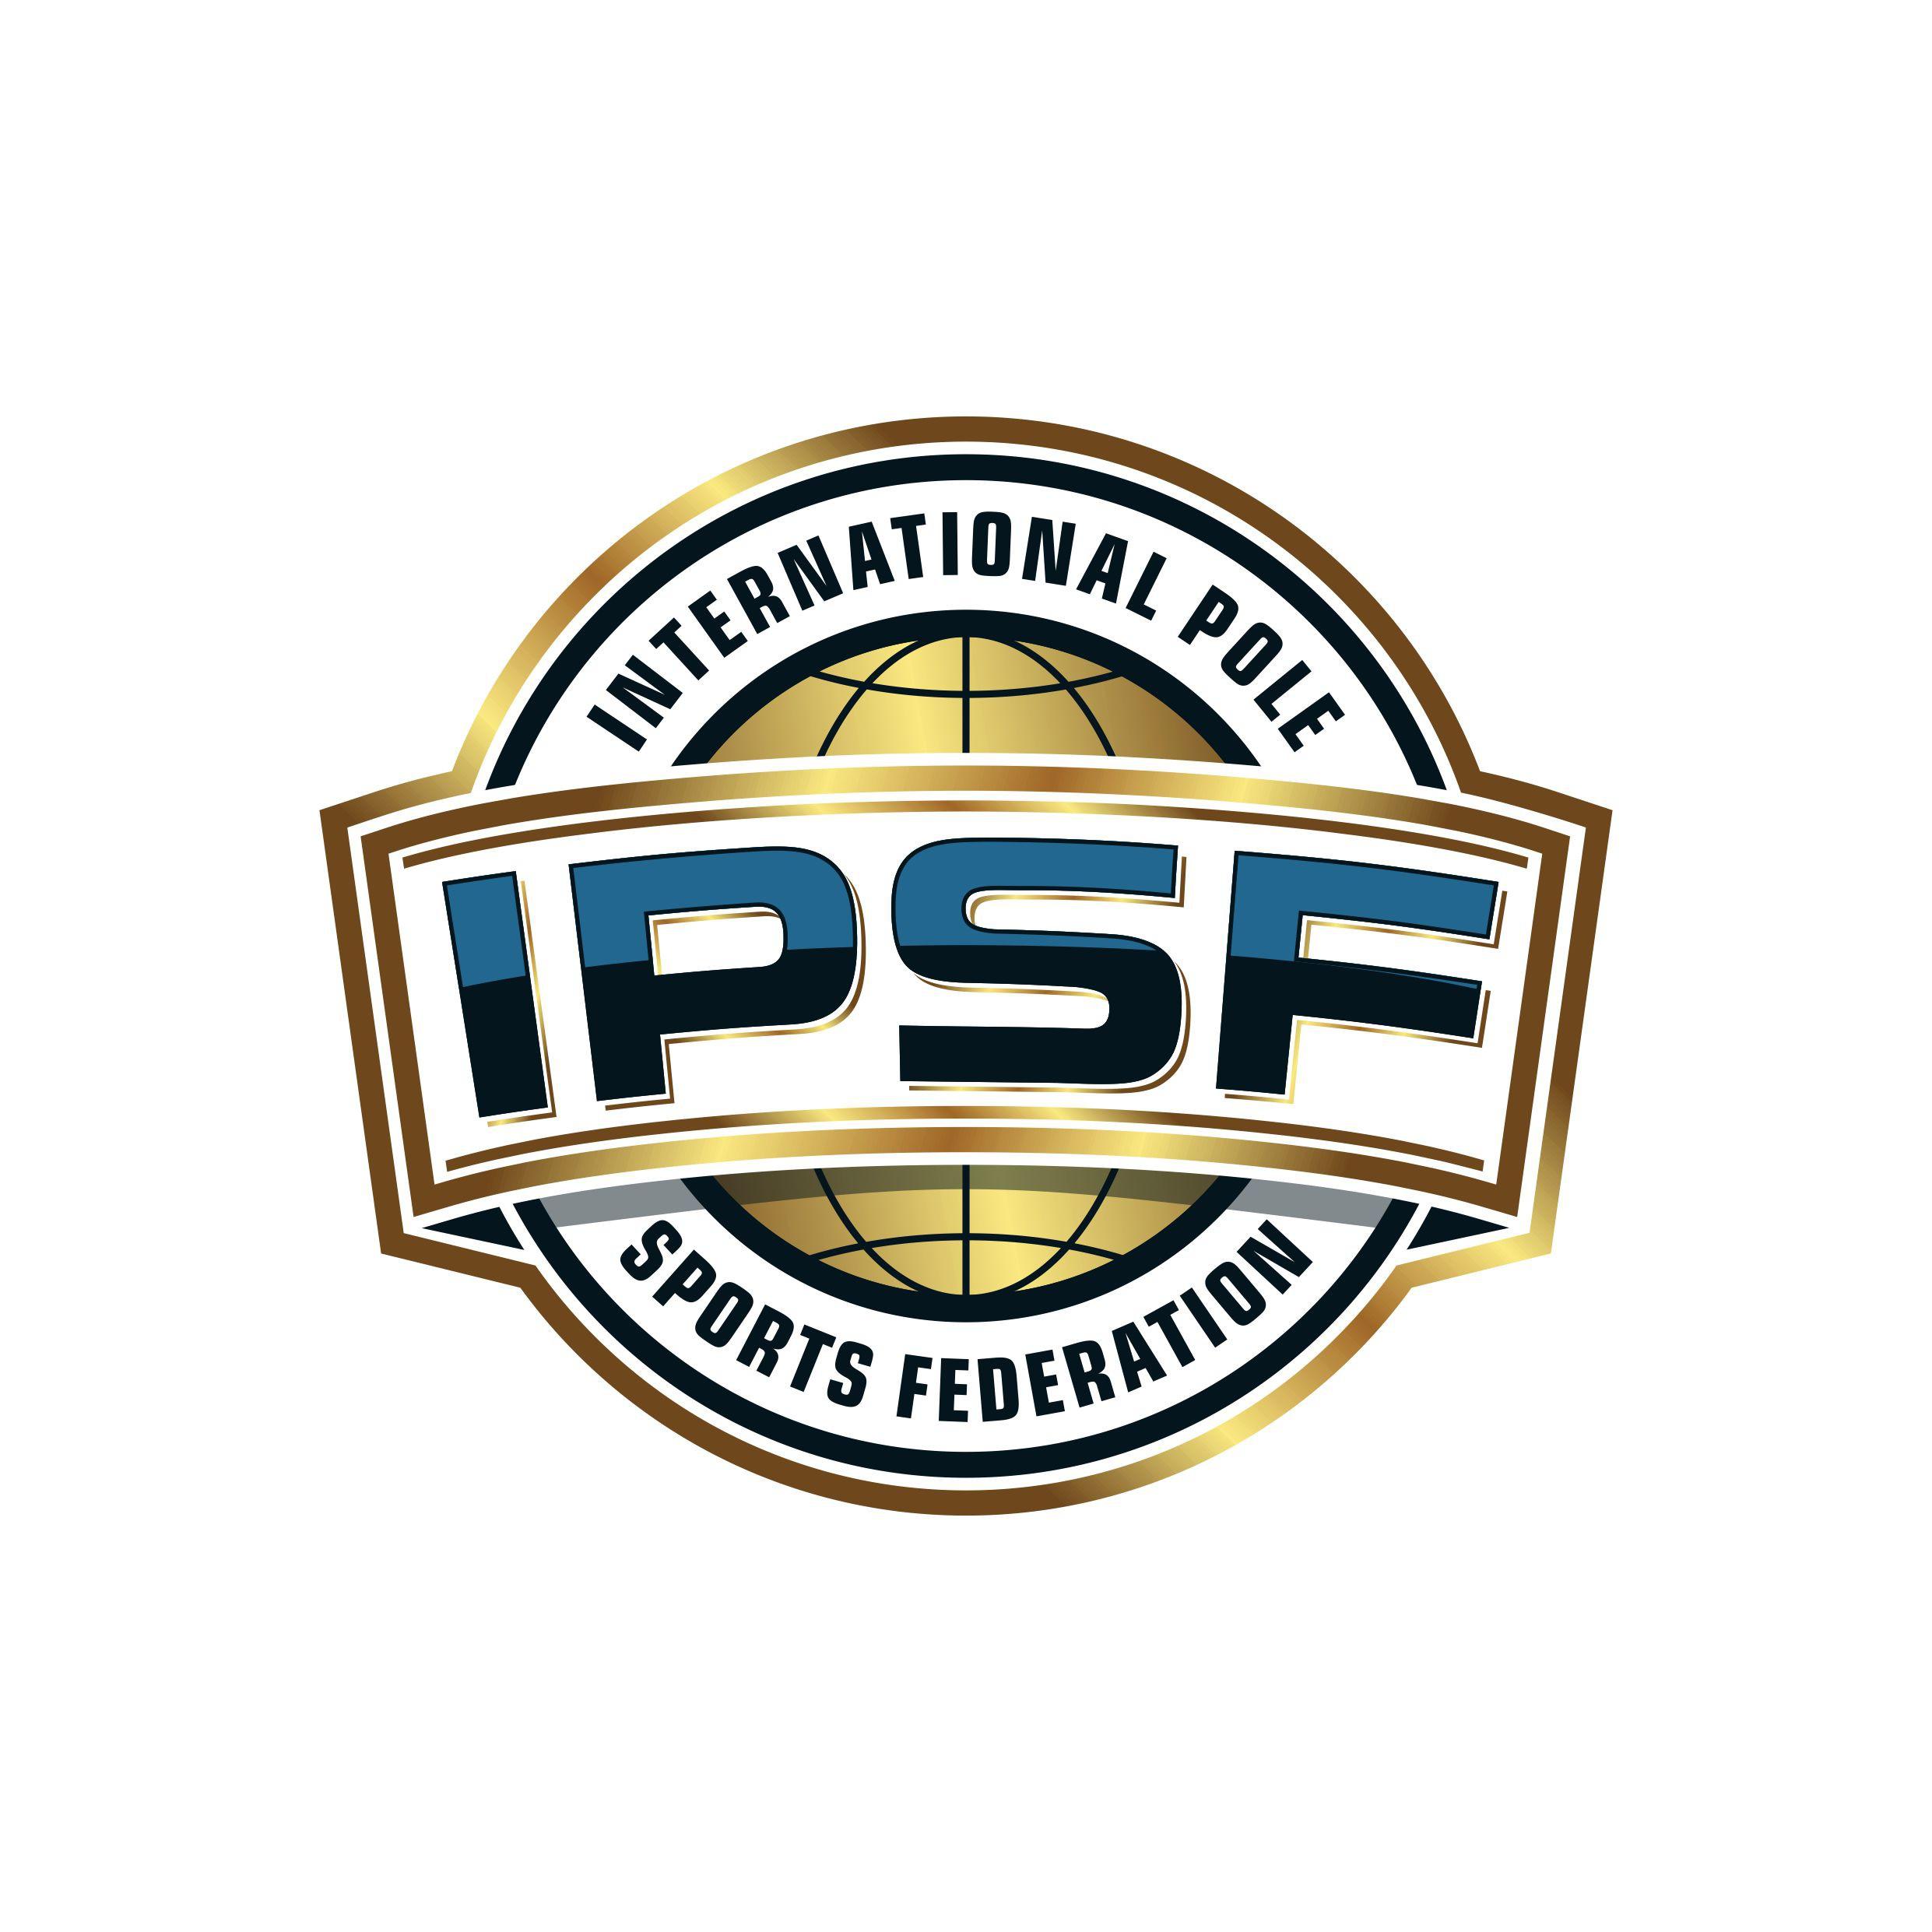 INTERNATIONAL POLE SPORTS FEDERATION NEEDS A COOL AND COMMANDING LOGO